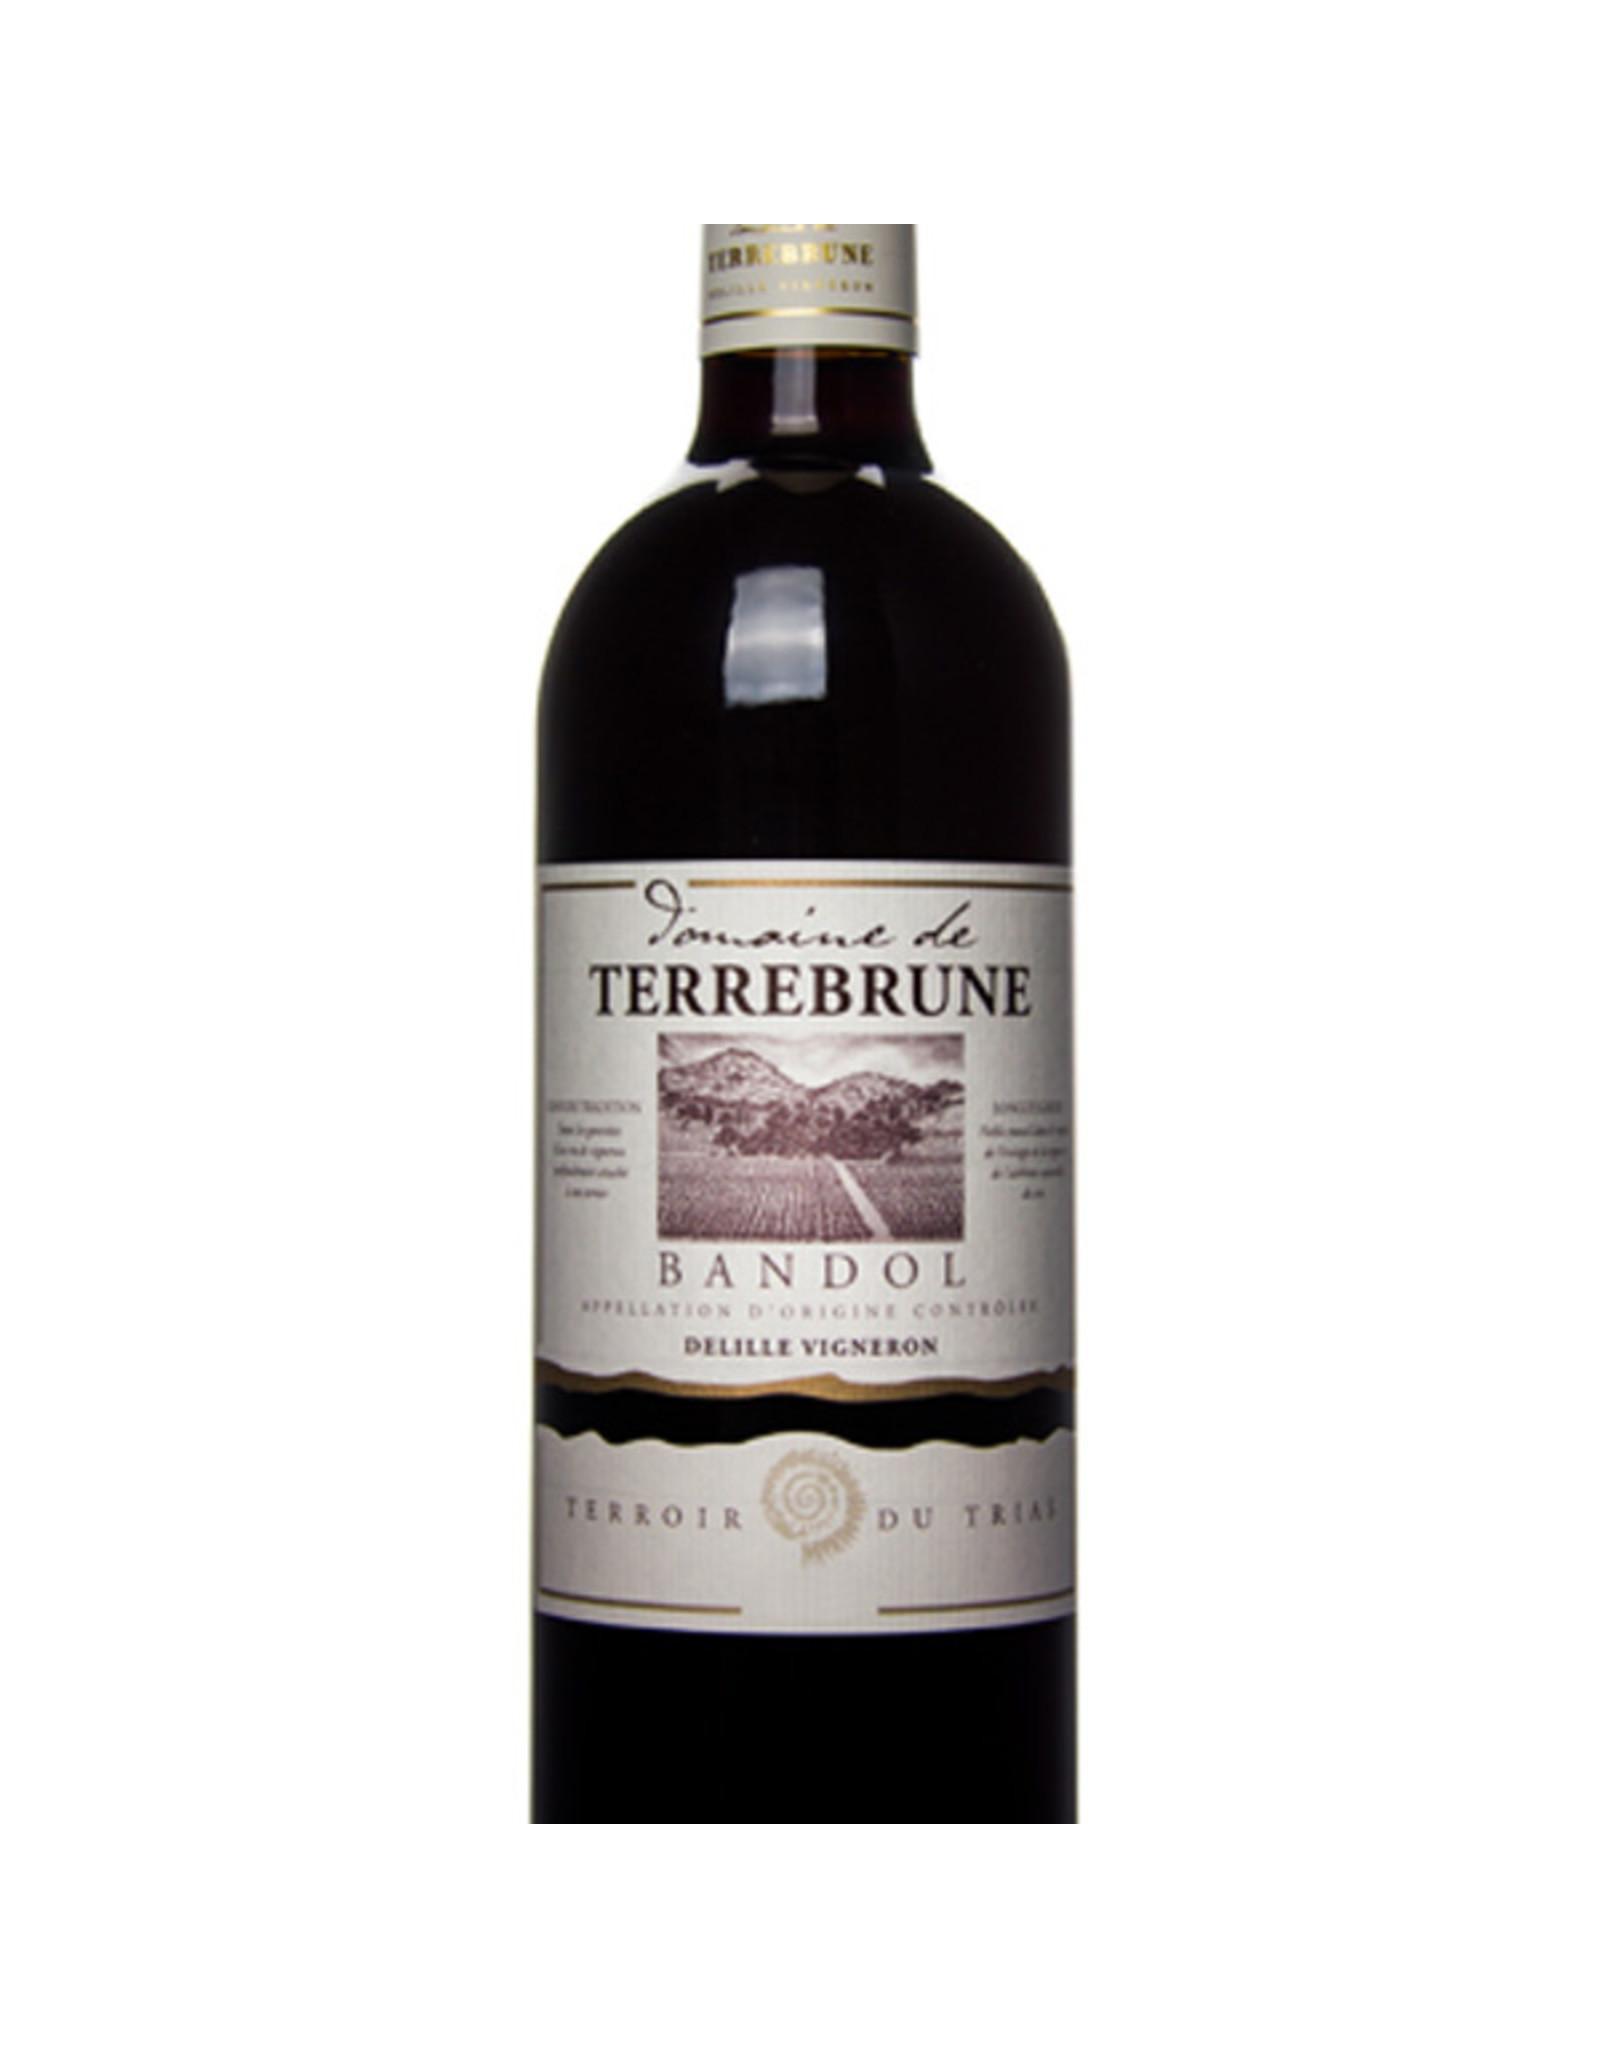 Domaine de Terrebrune, Ollioules Terrebrune Bandol Rouge 2016 magnum